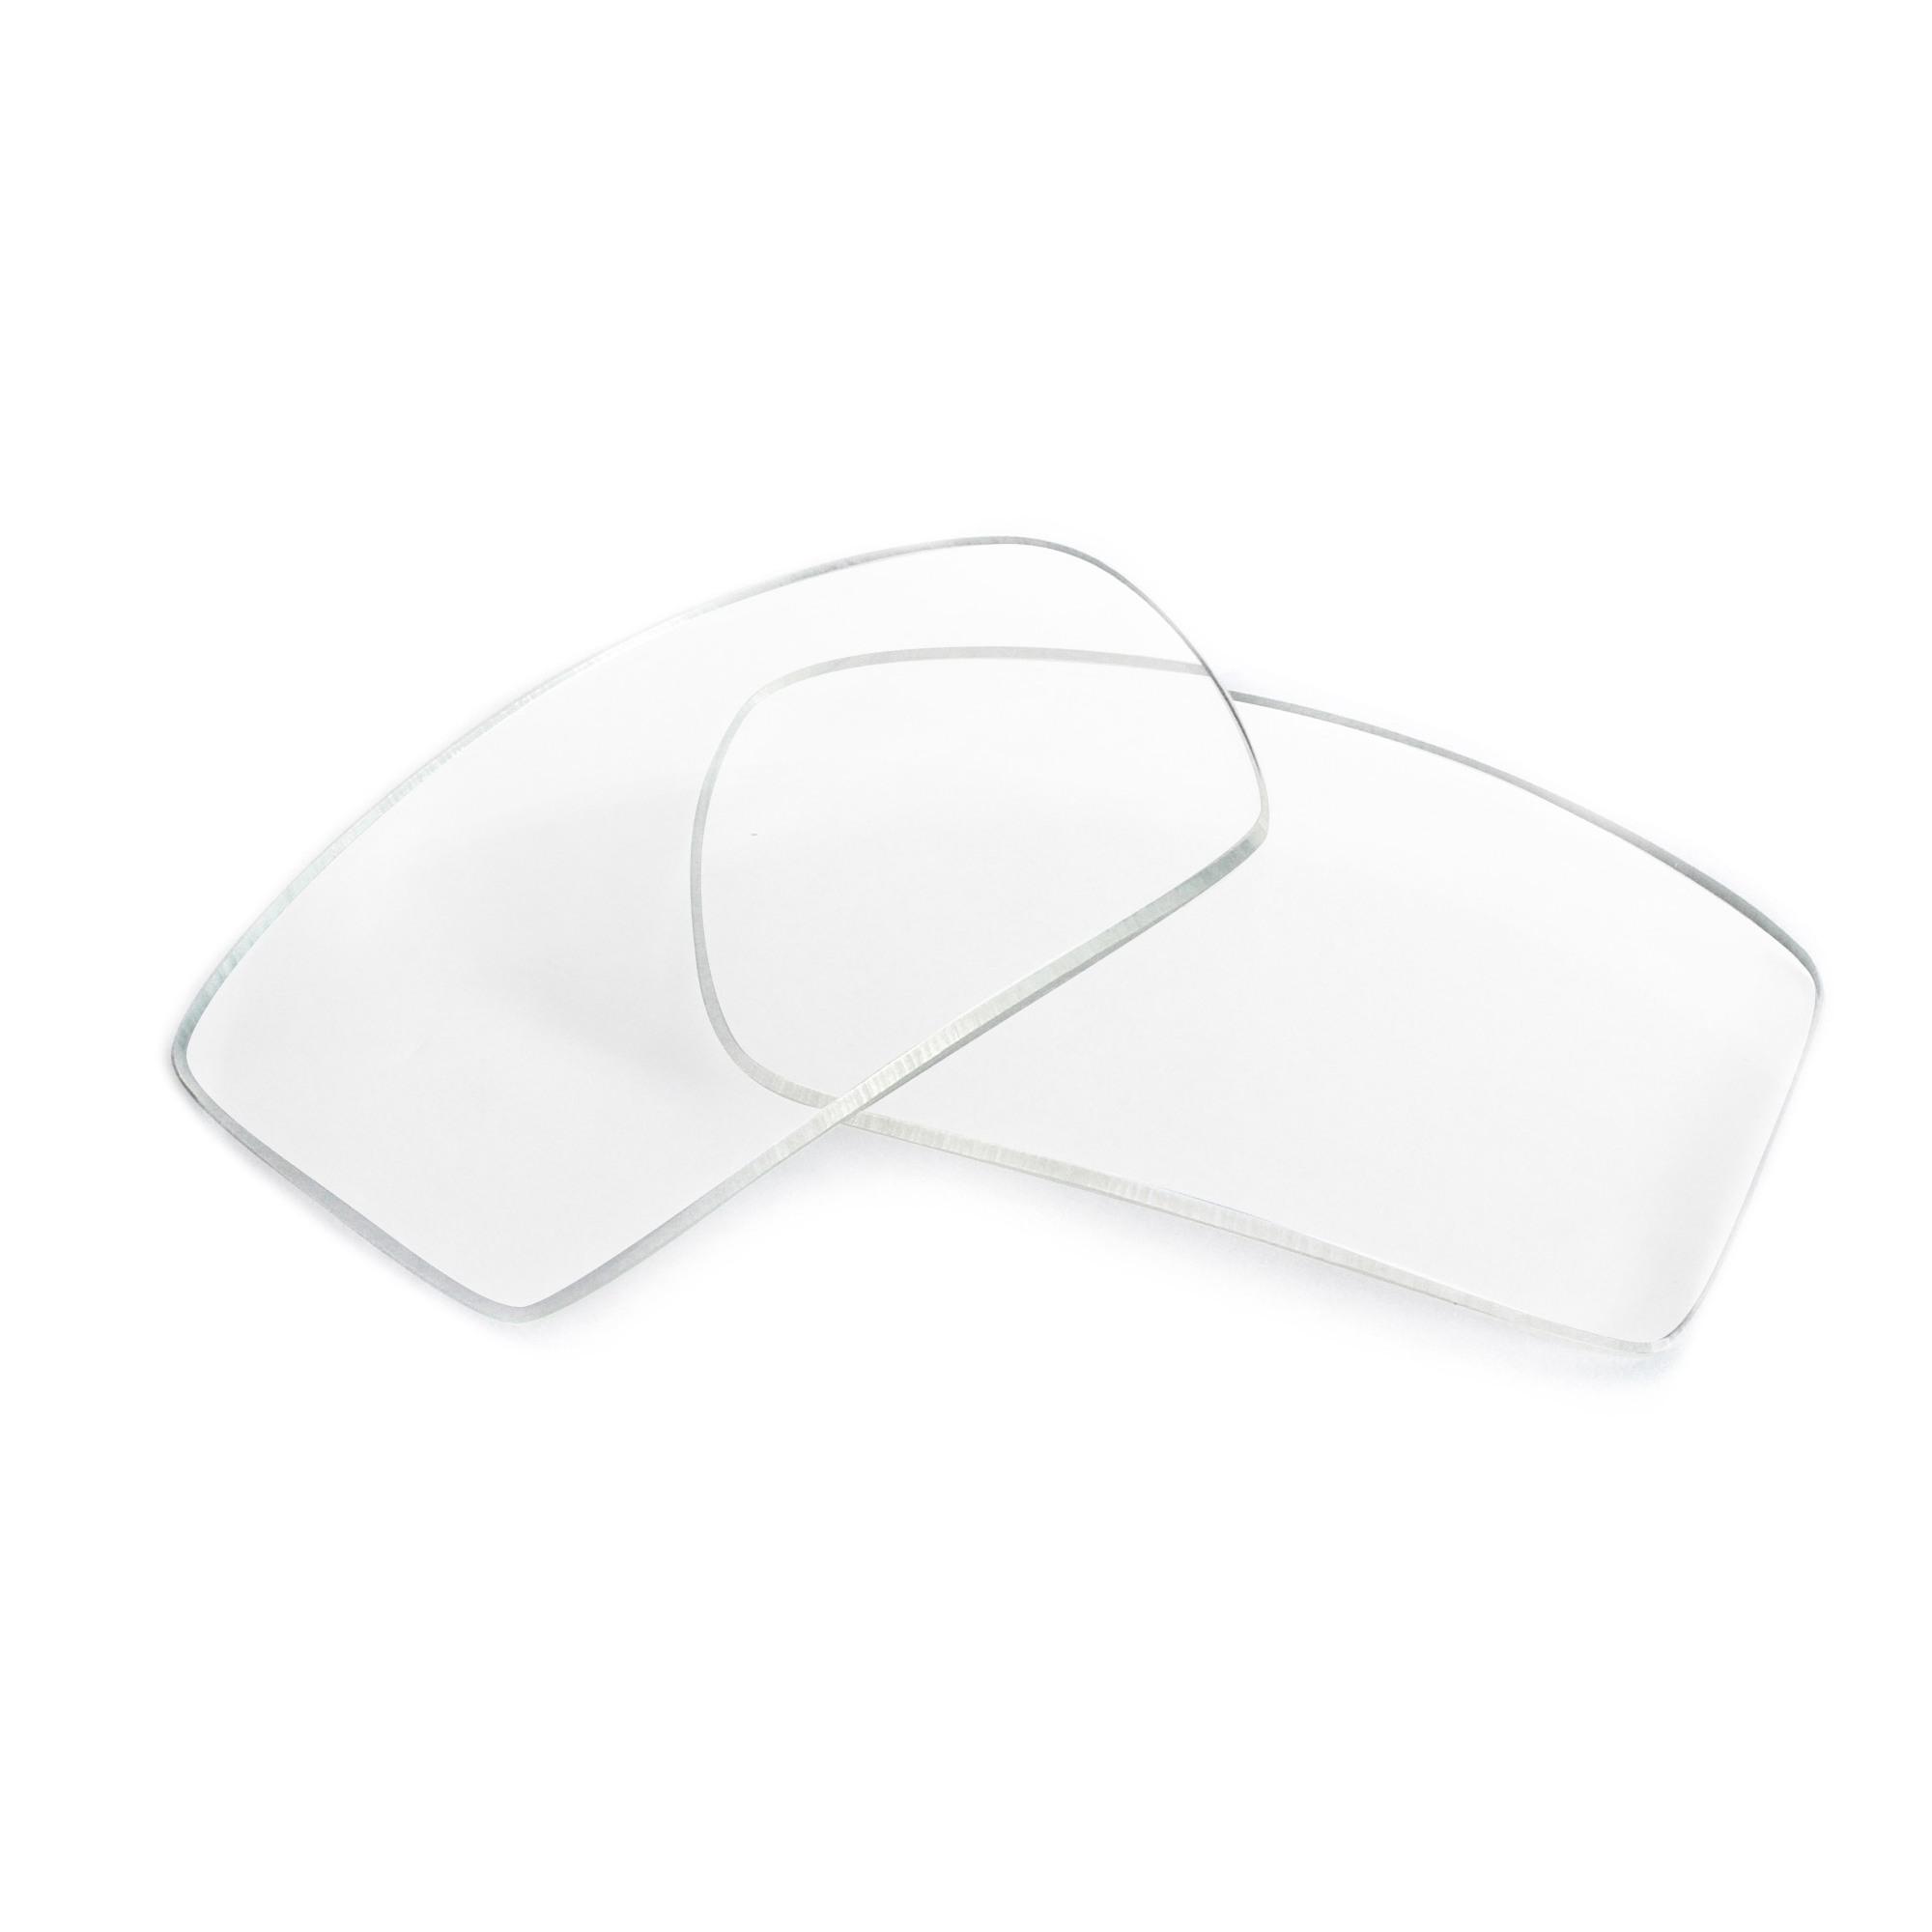 Fuse Lenses Non-Polarized Replacement Lenses for Arnette Asylum AN4058